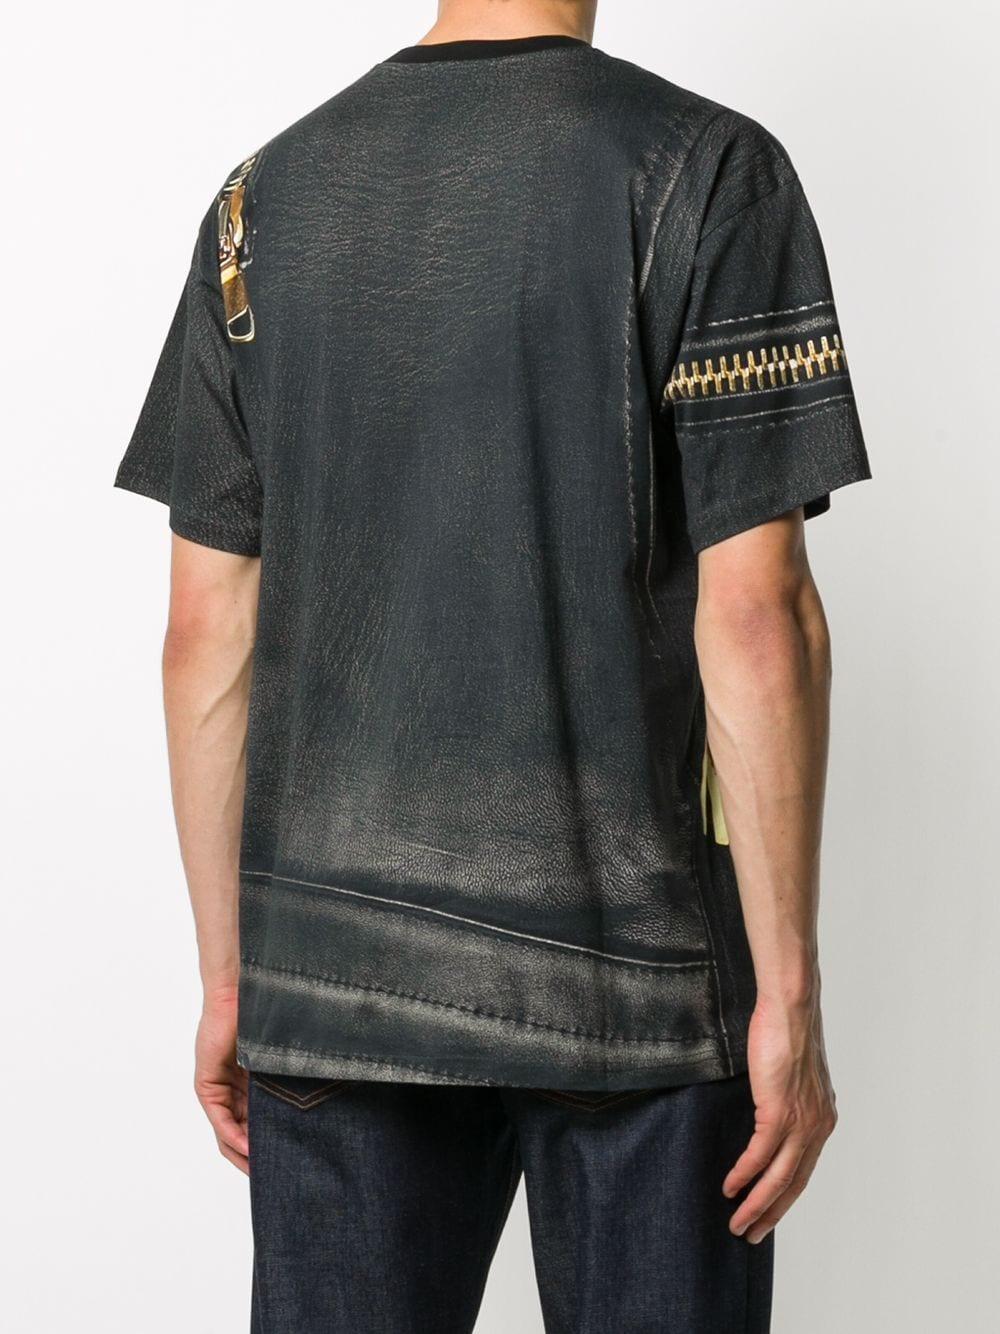 T-SHIRT NERA MOSCHINO | T-shirt | 07095240A1888